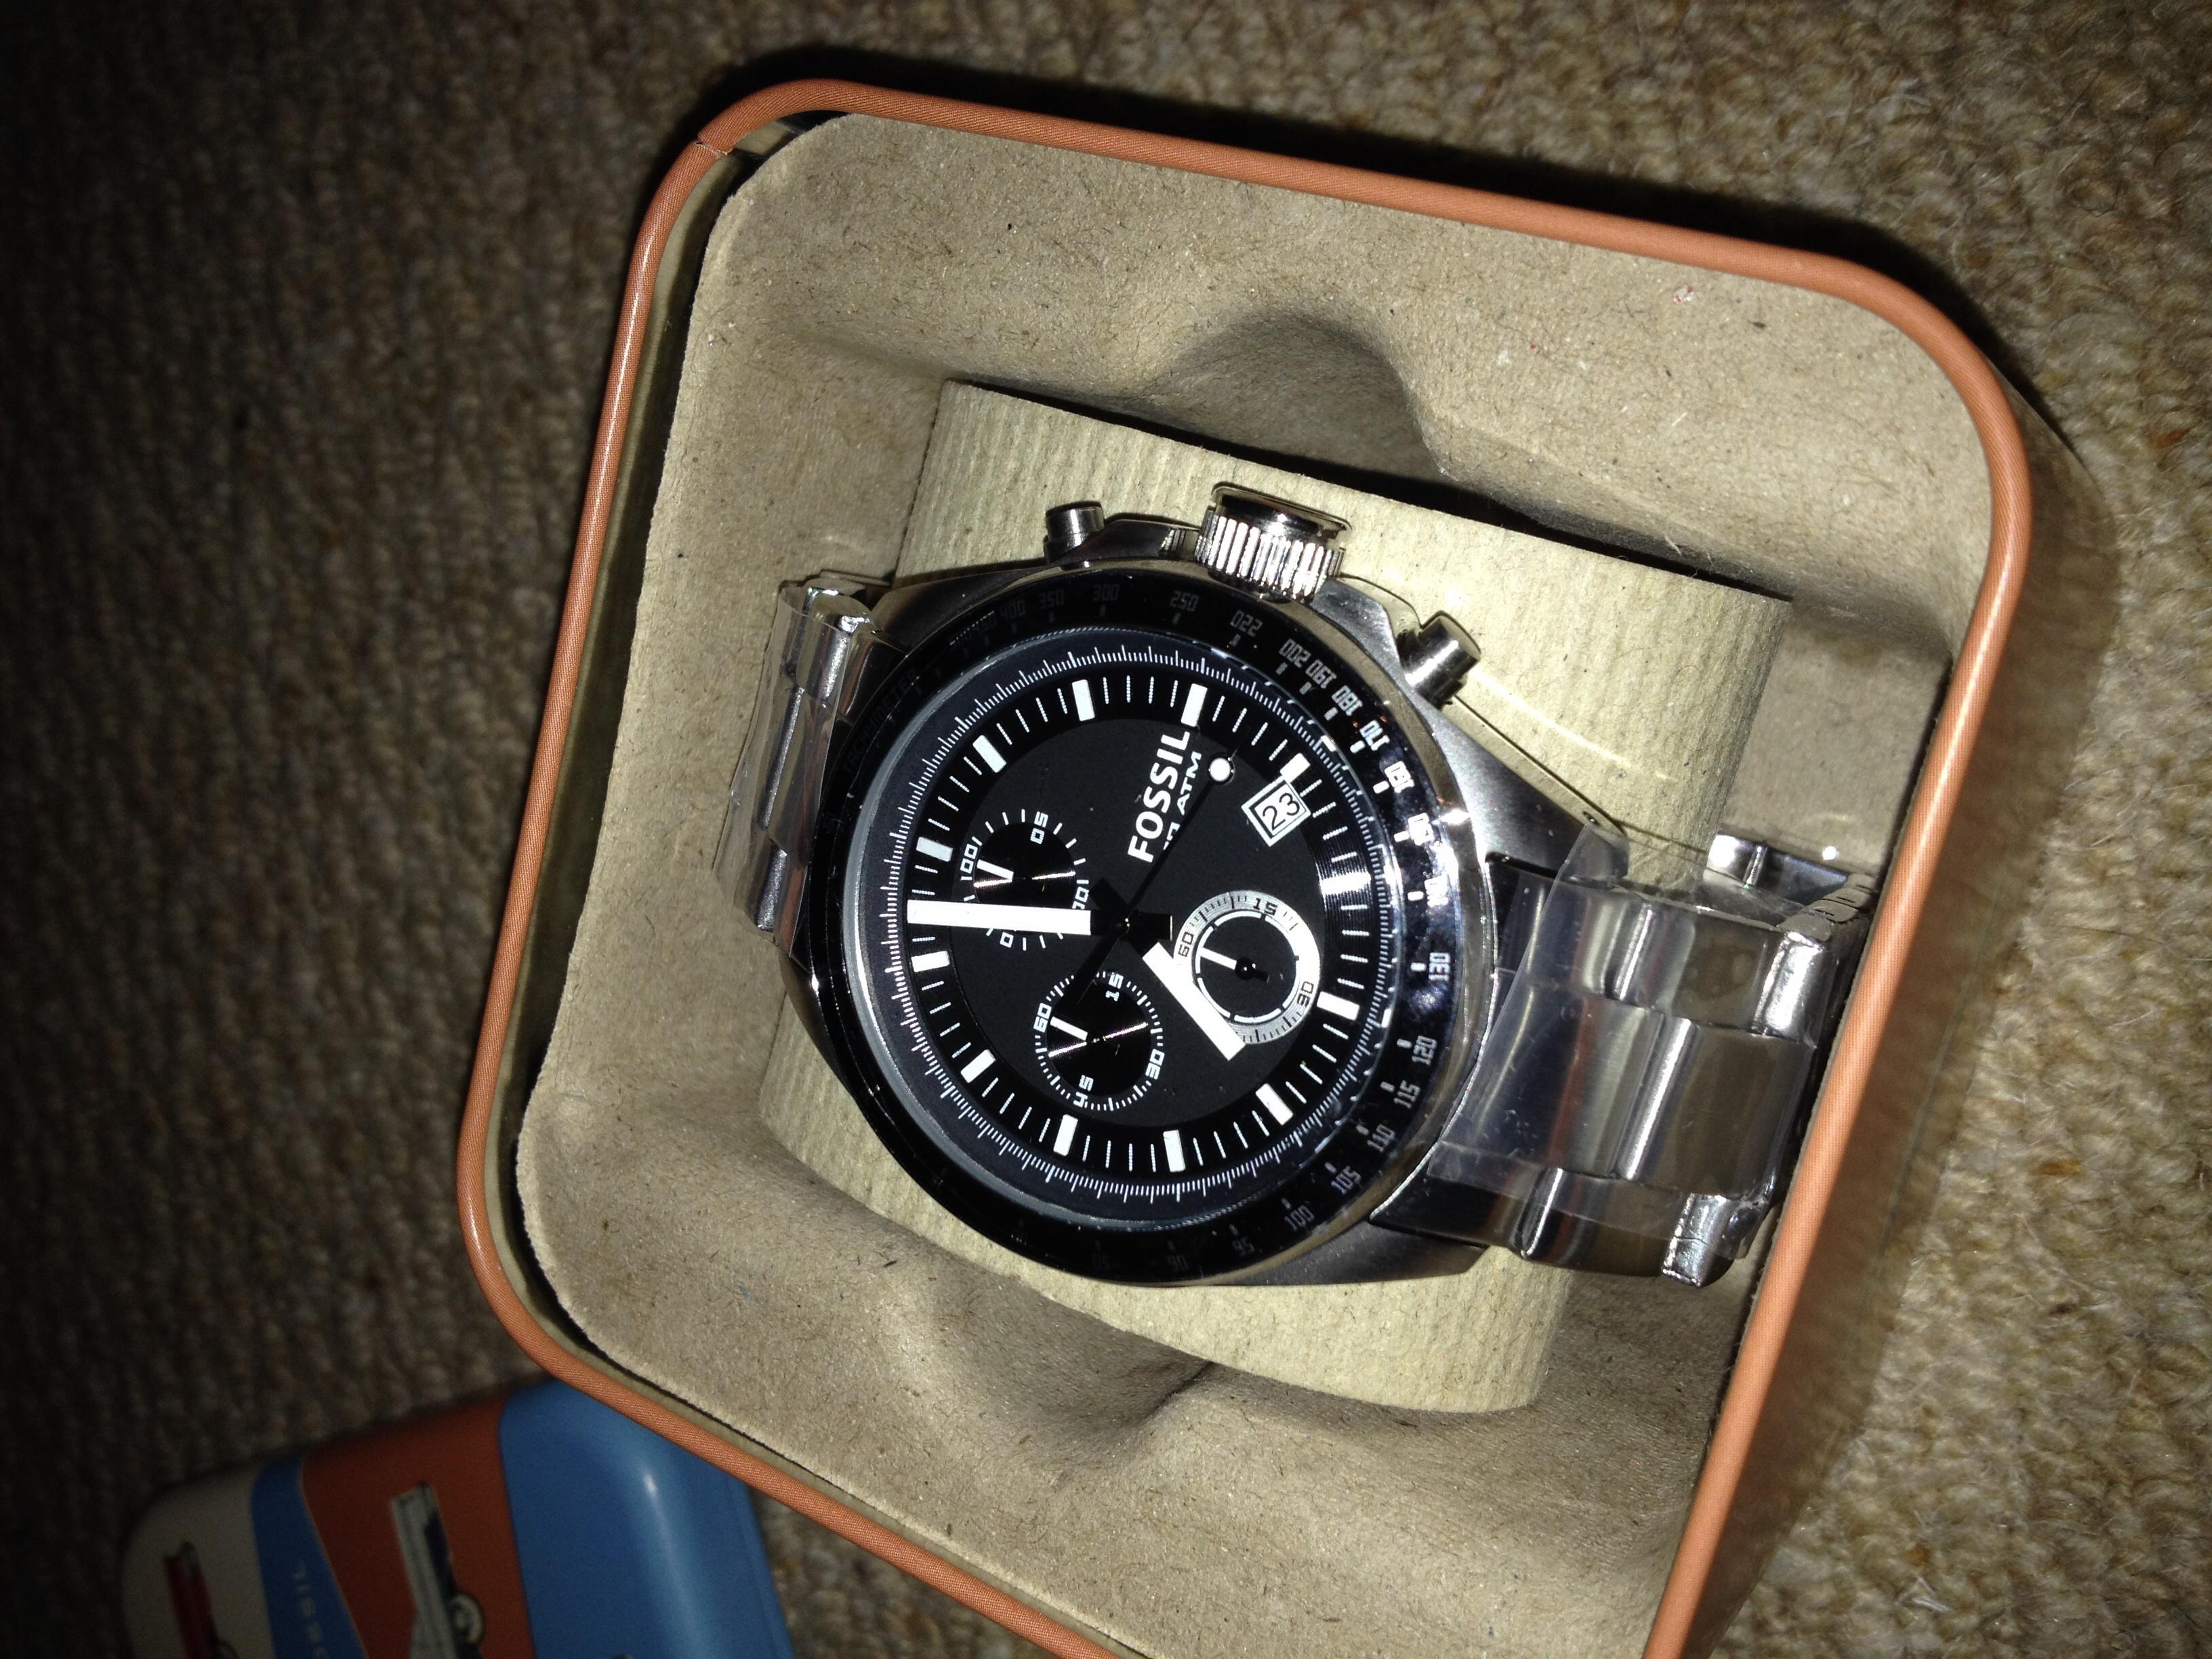 Gents Fossil Decker Chronograph Watch Ch2600ie Watchshop Com